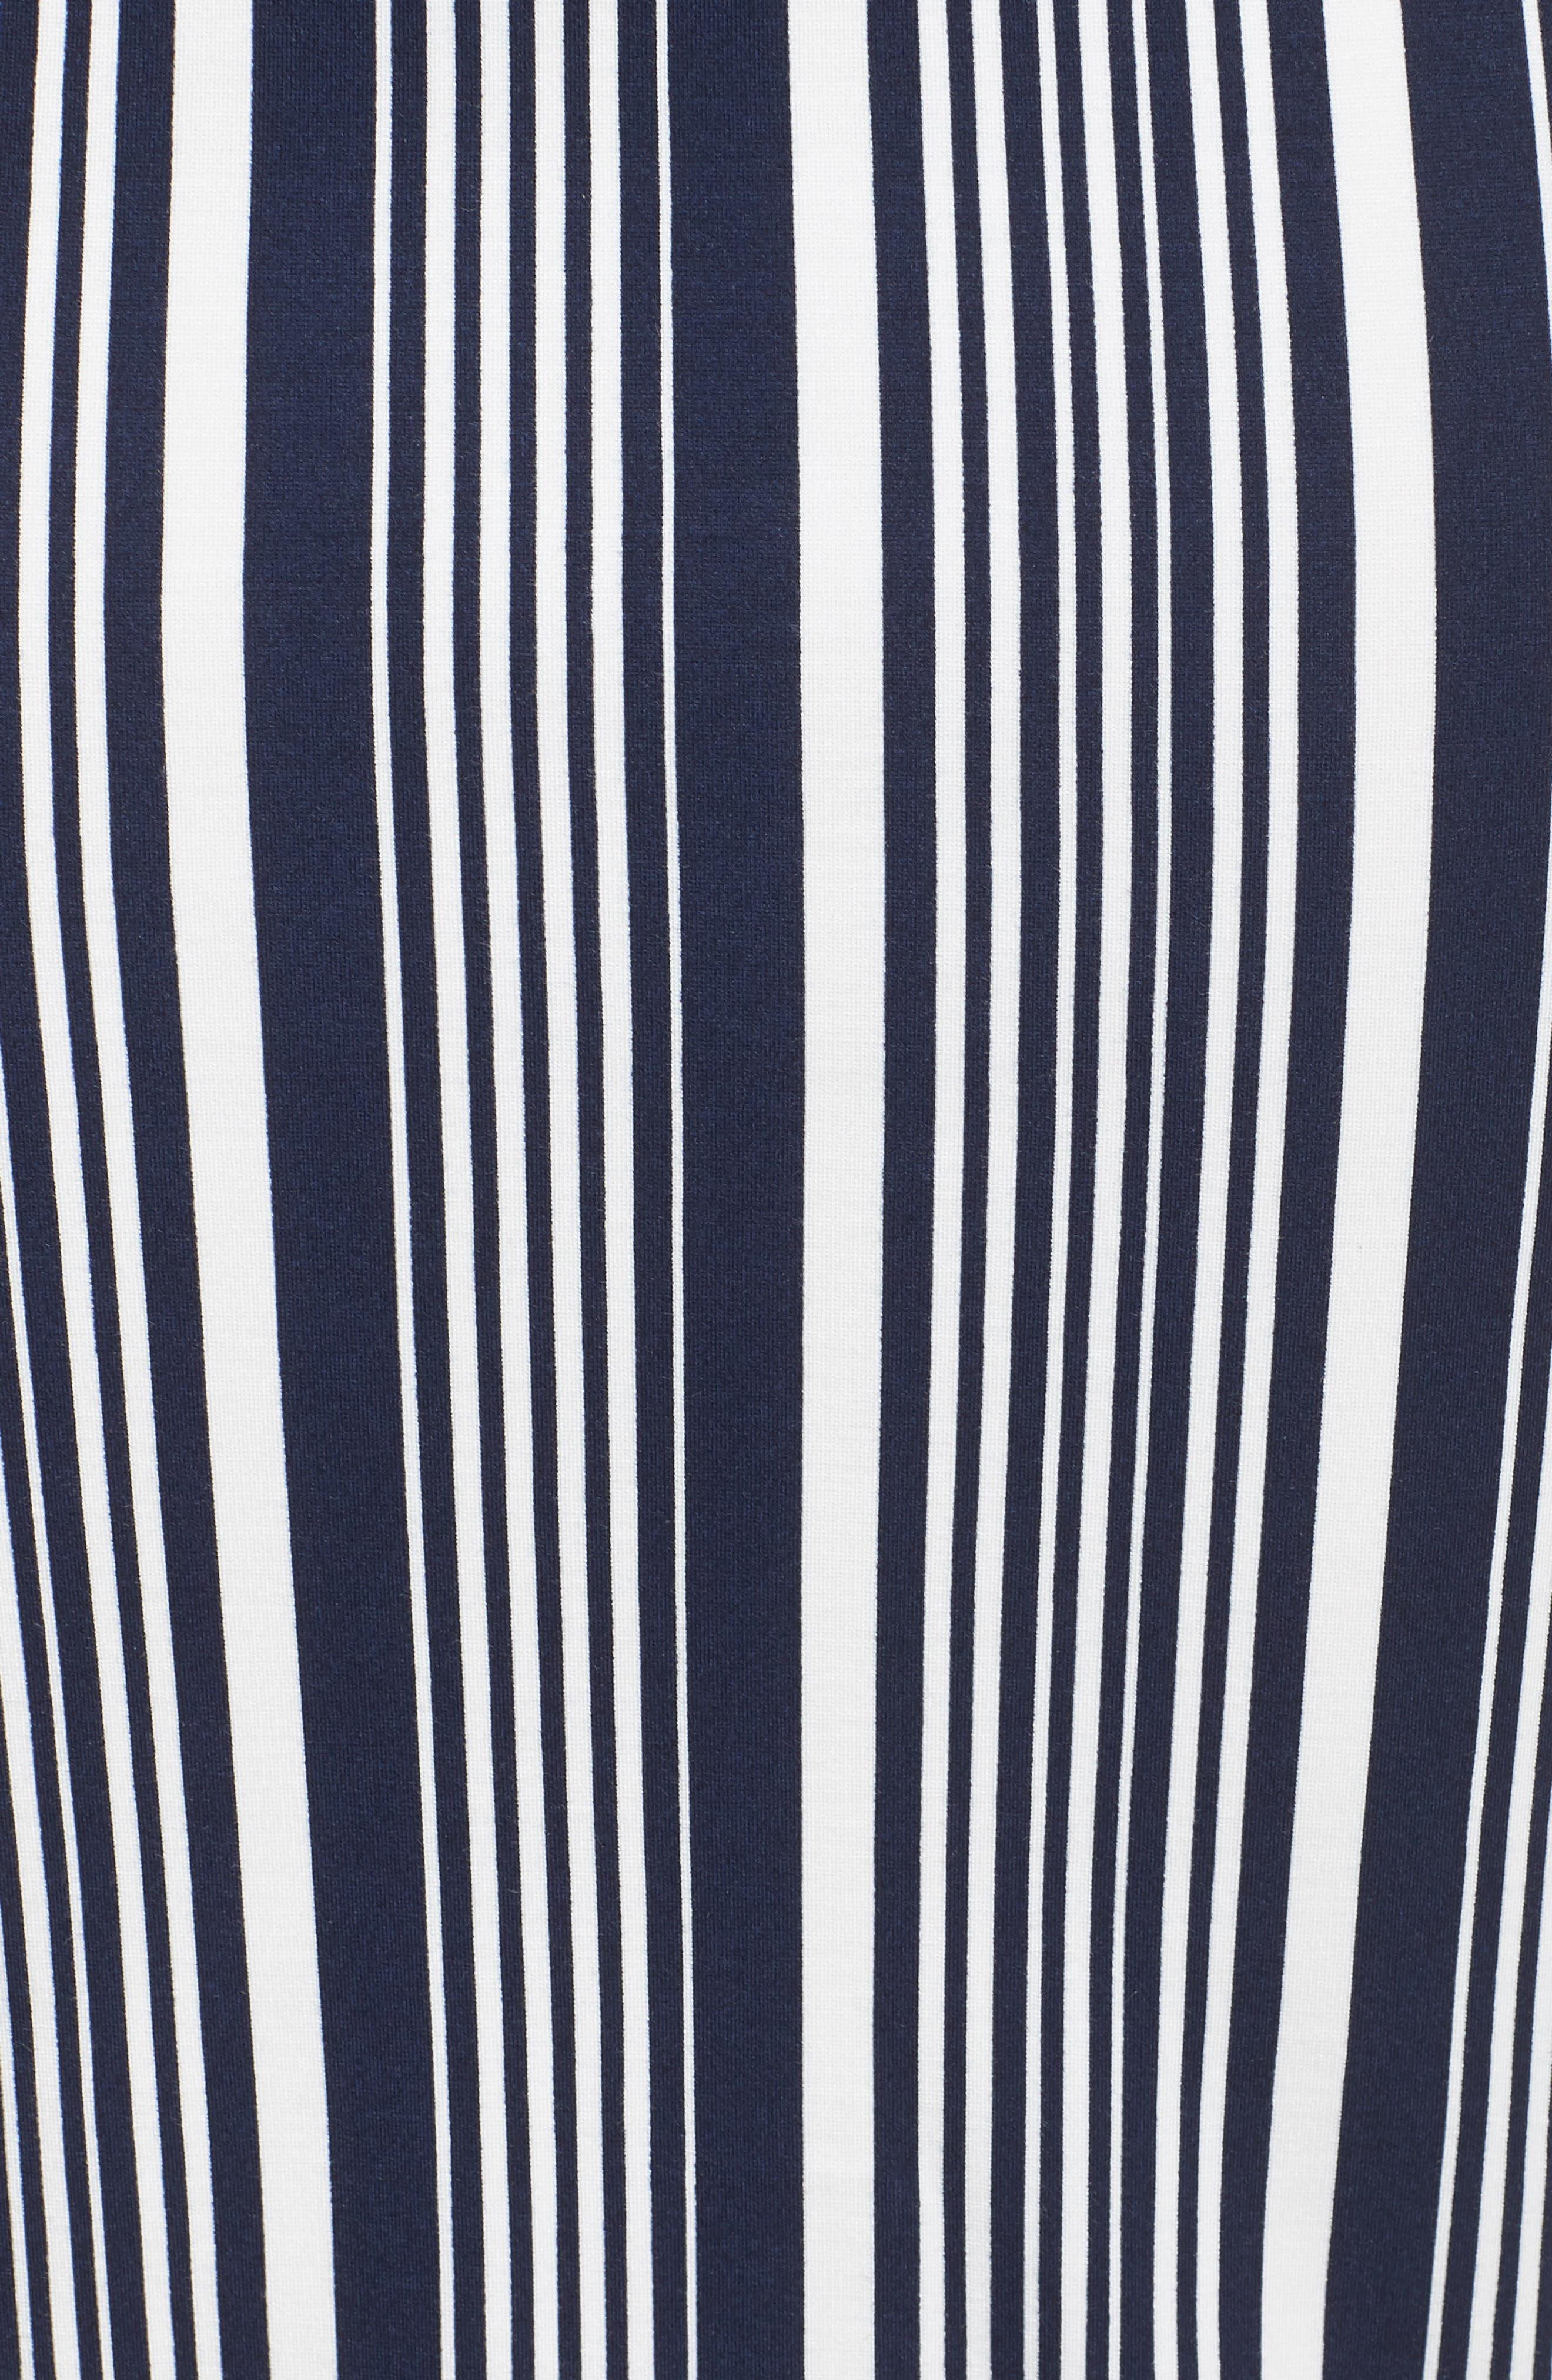 Stripe Ponte Pencil Skirt,                             Alternate thumbnail 5, color,